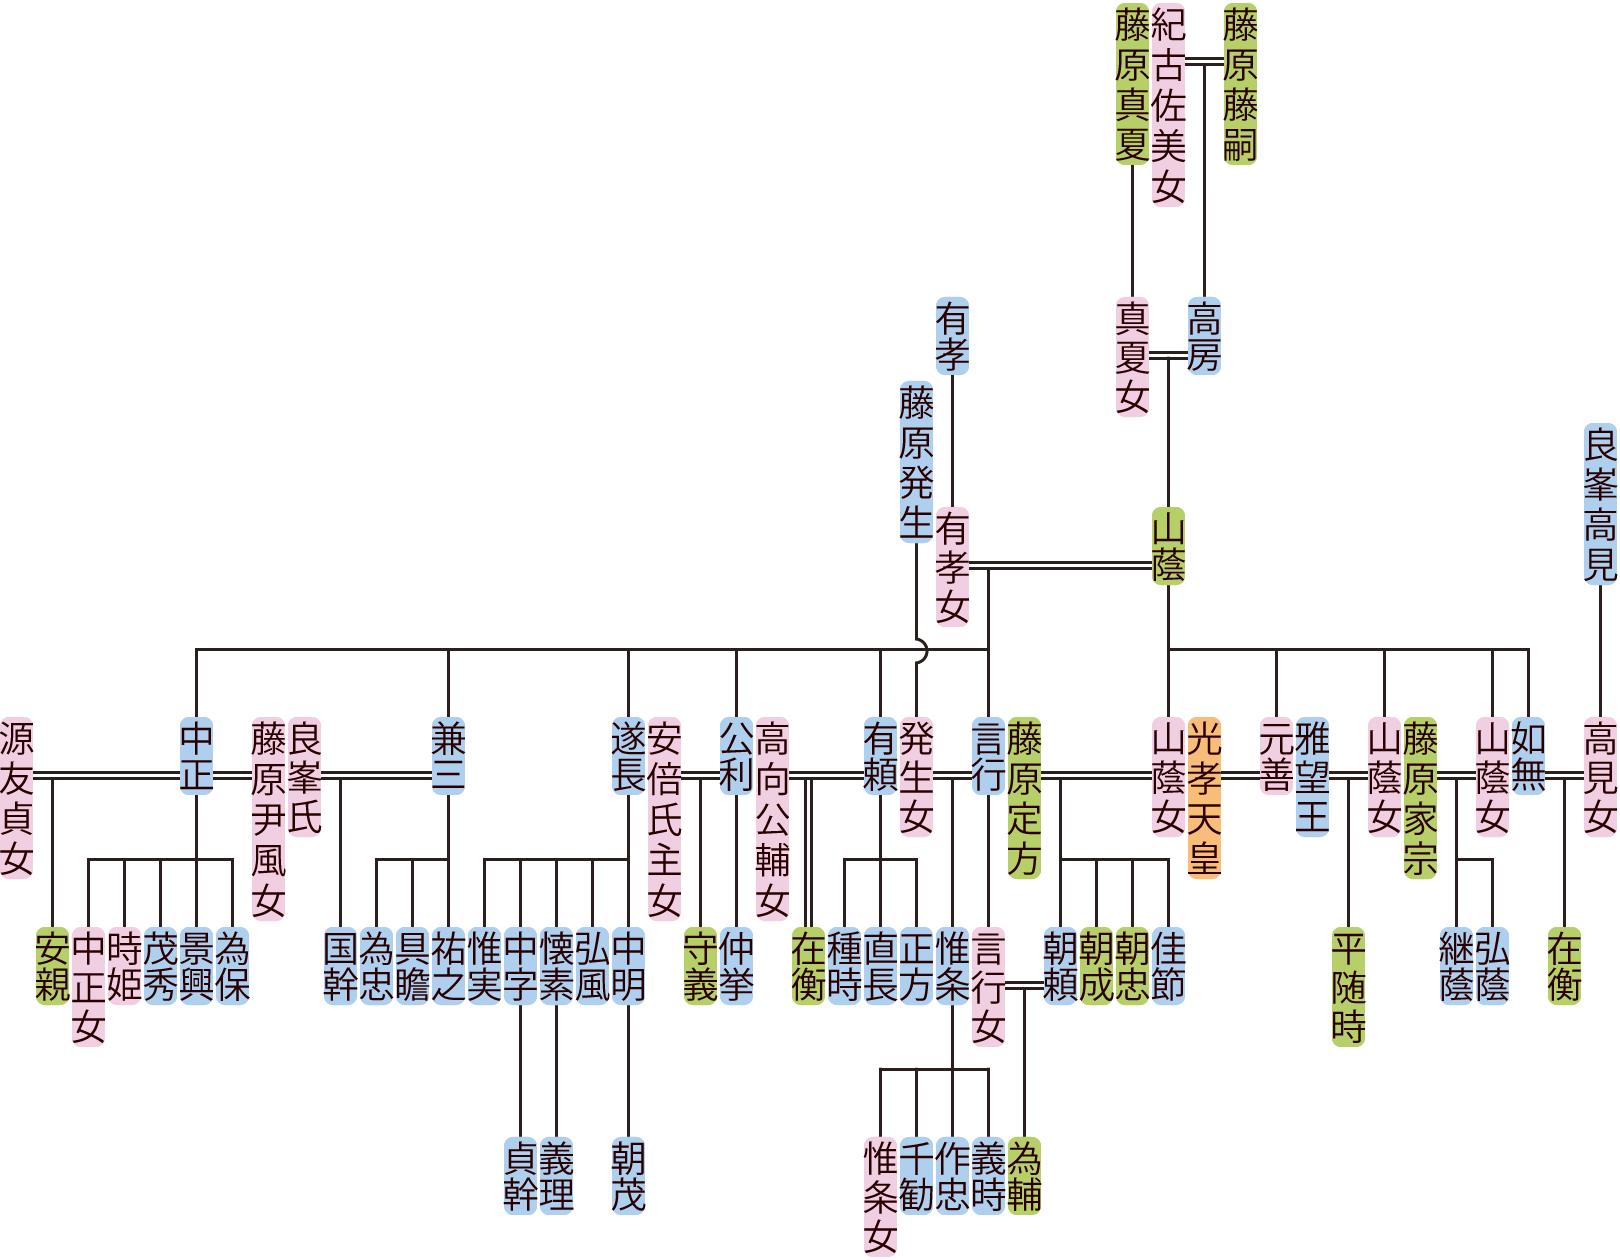 藤原山蔭の系図